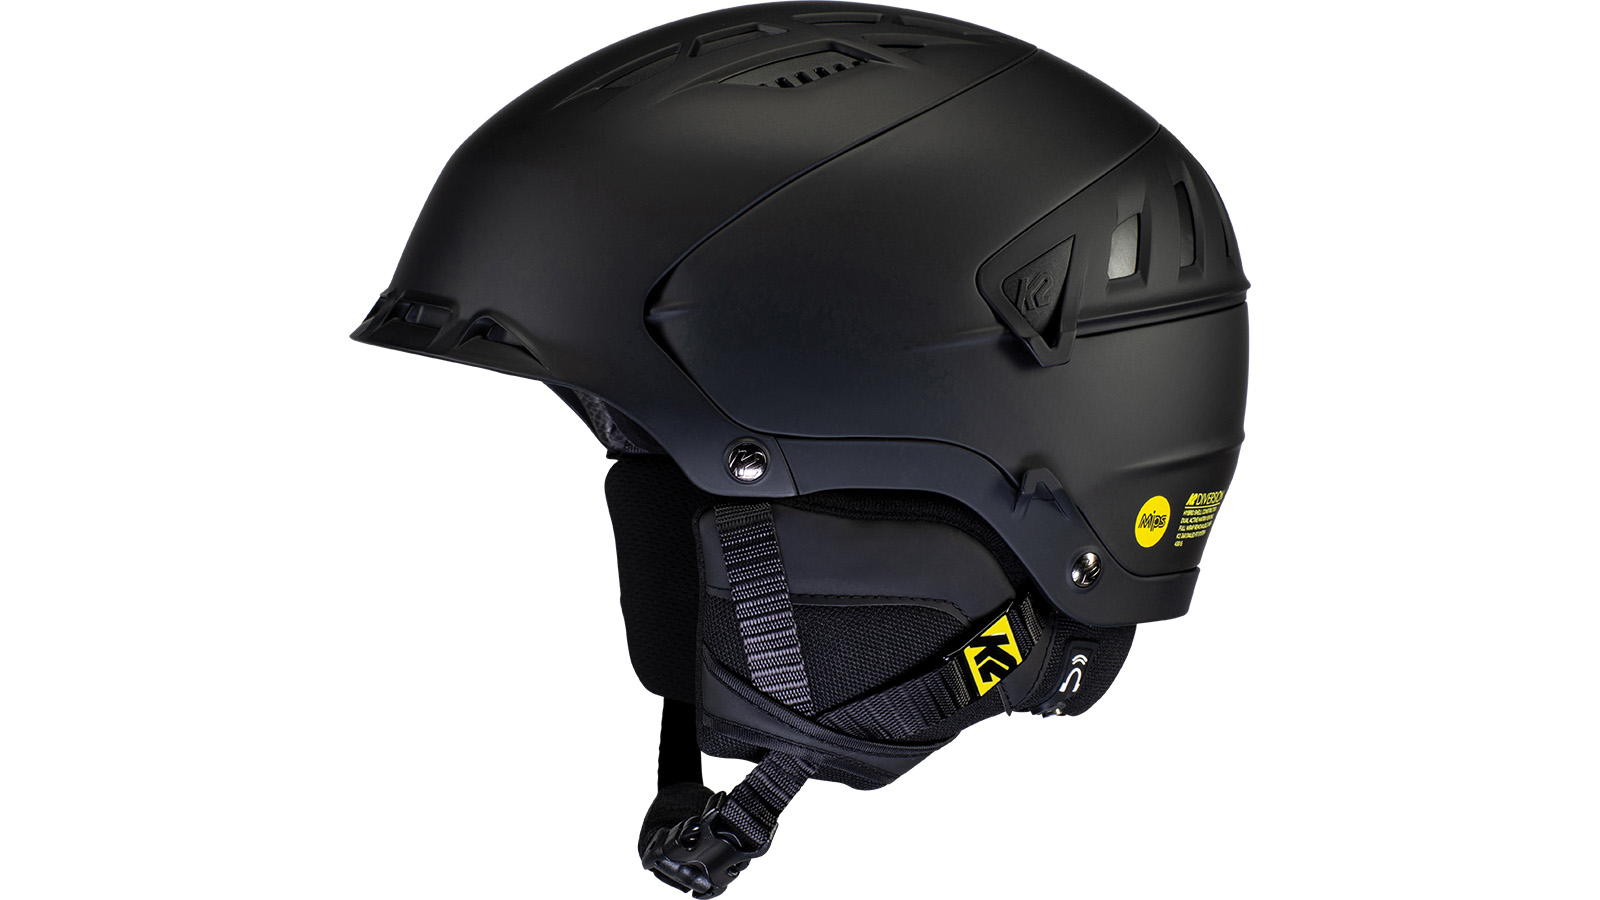 K2 FW20/21 Snow Helmets